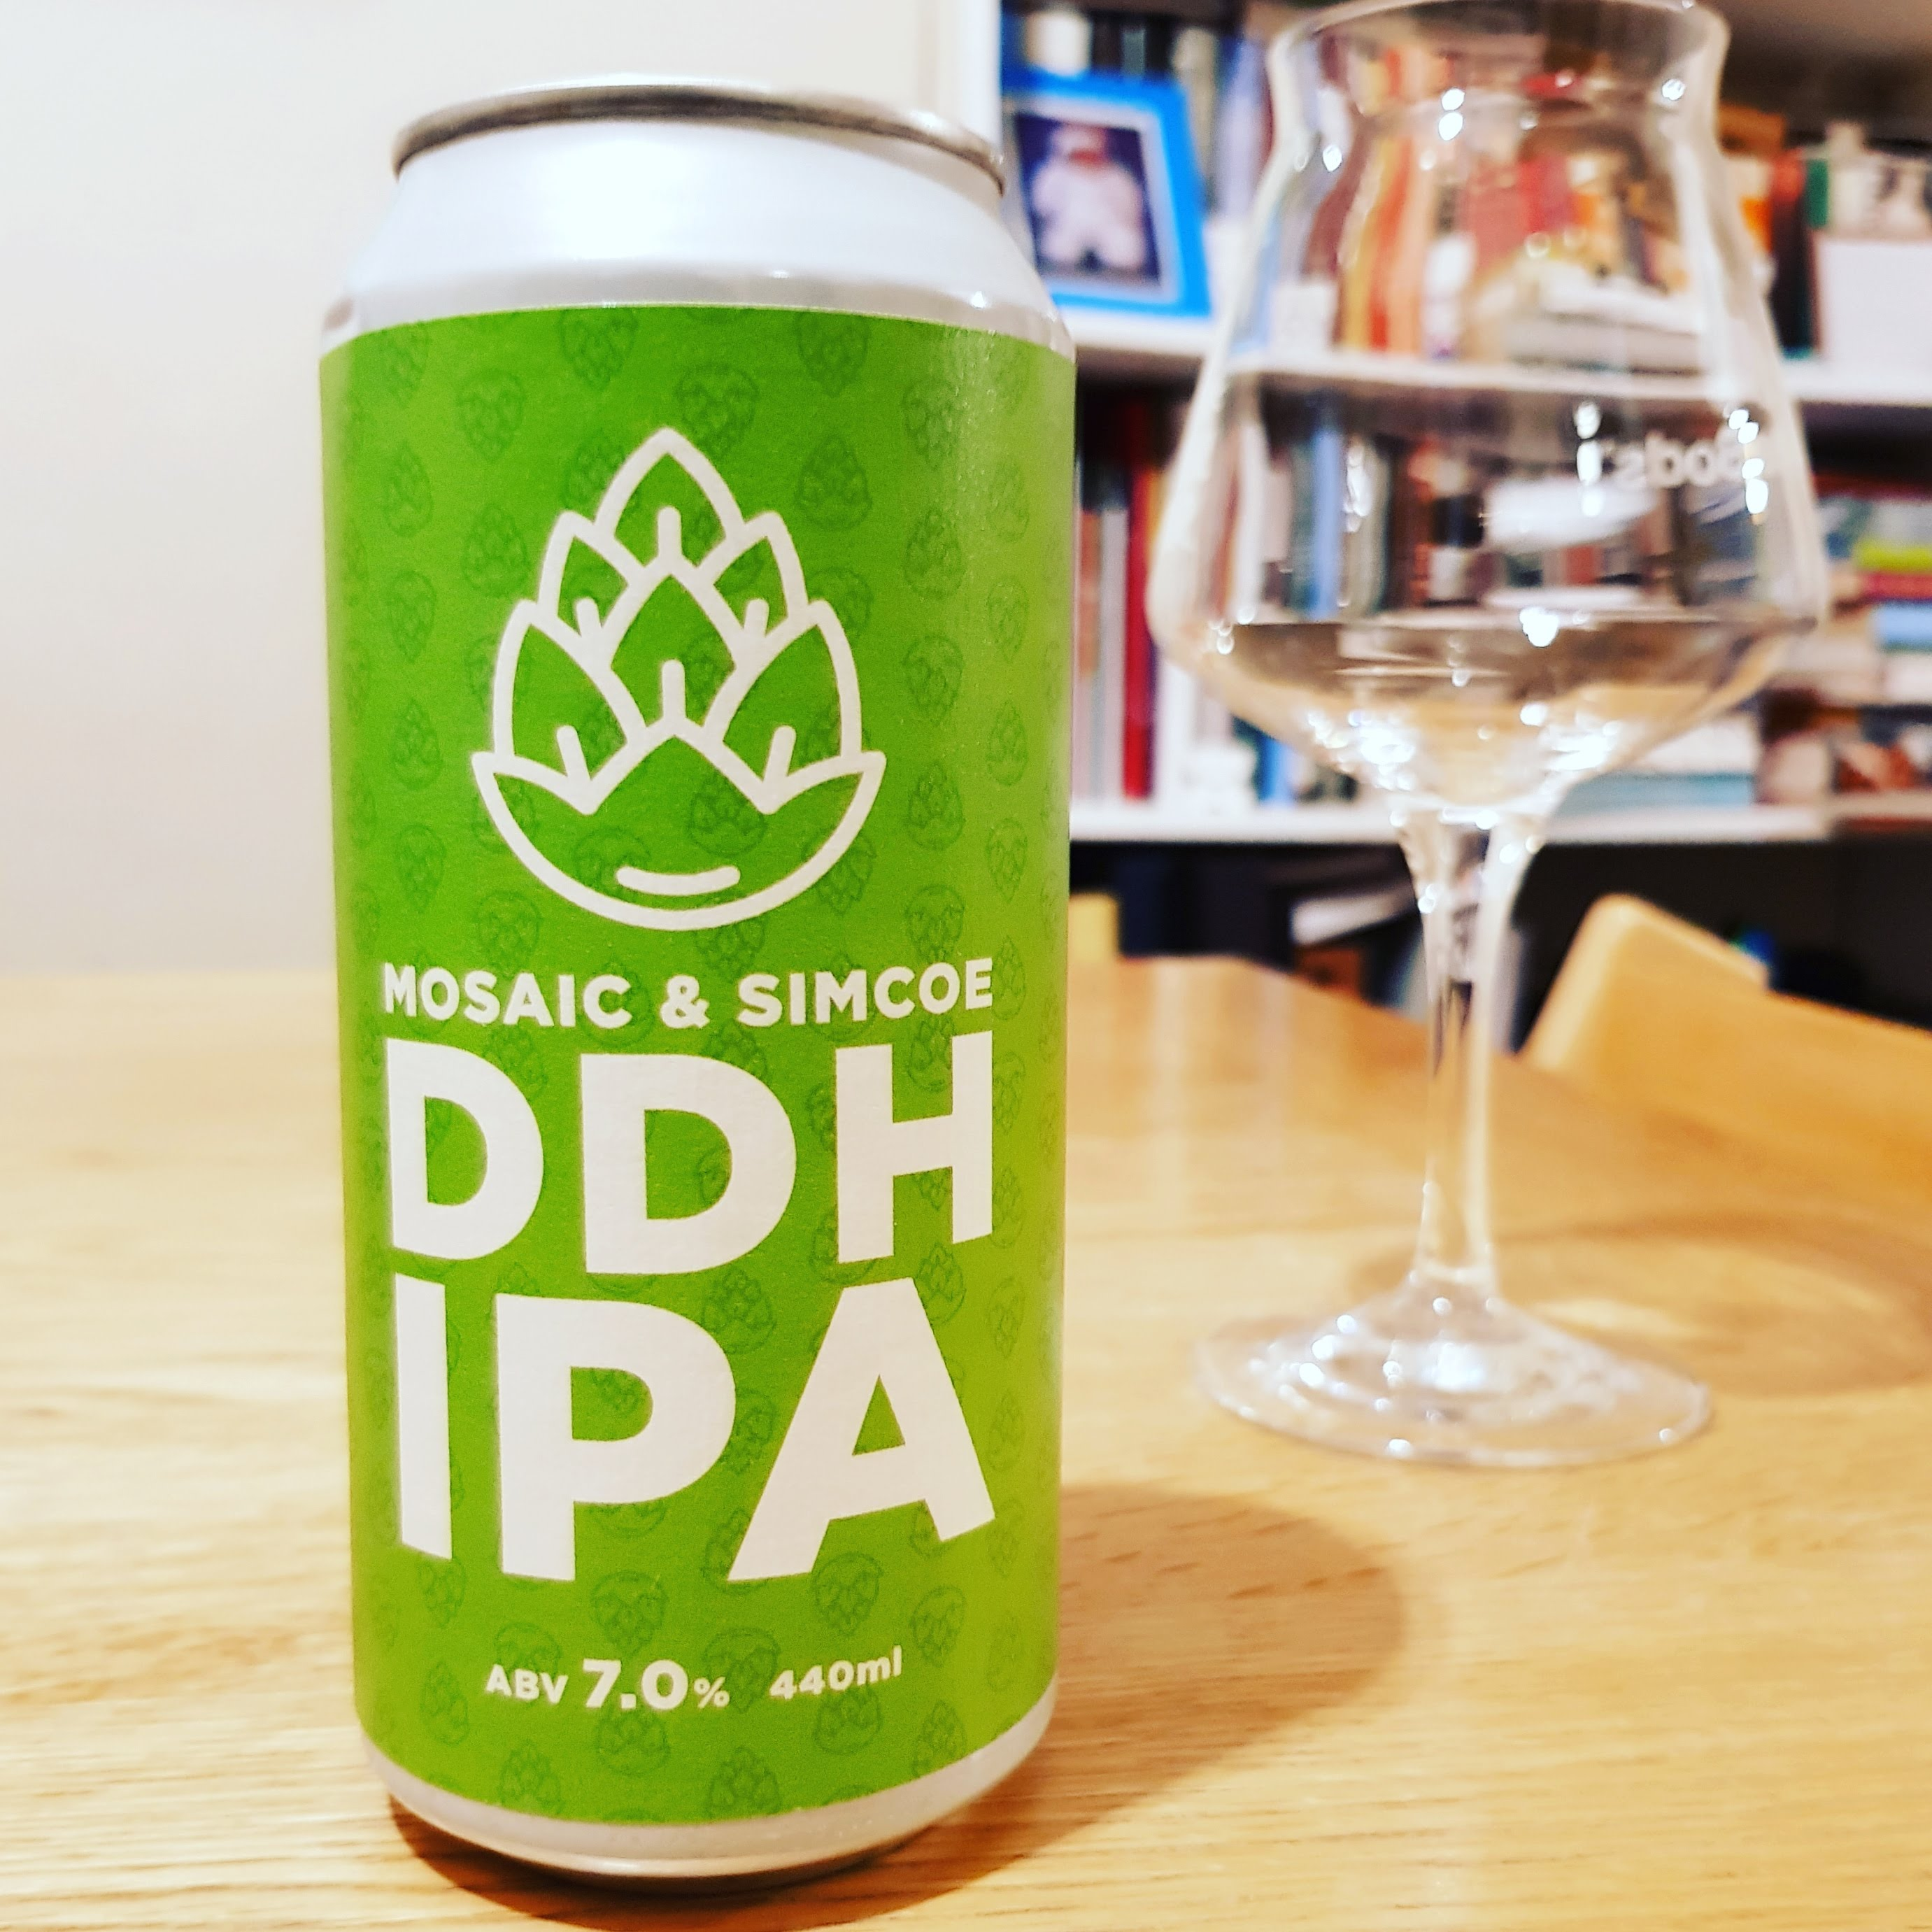 Hop Stuff Brewery, Mosaic and Simcoe DDH IPA